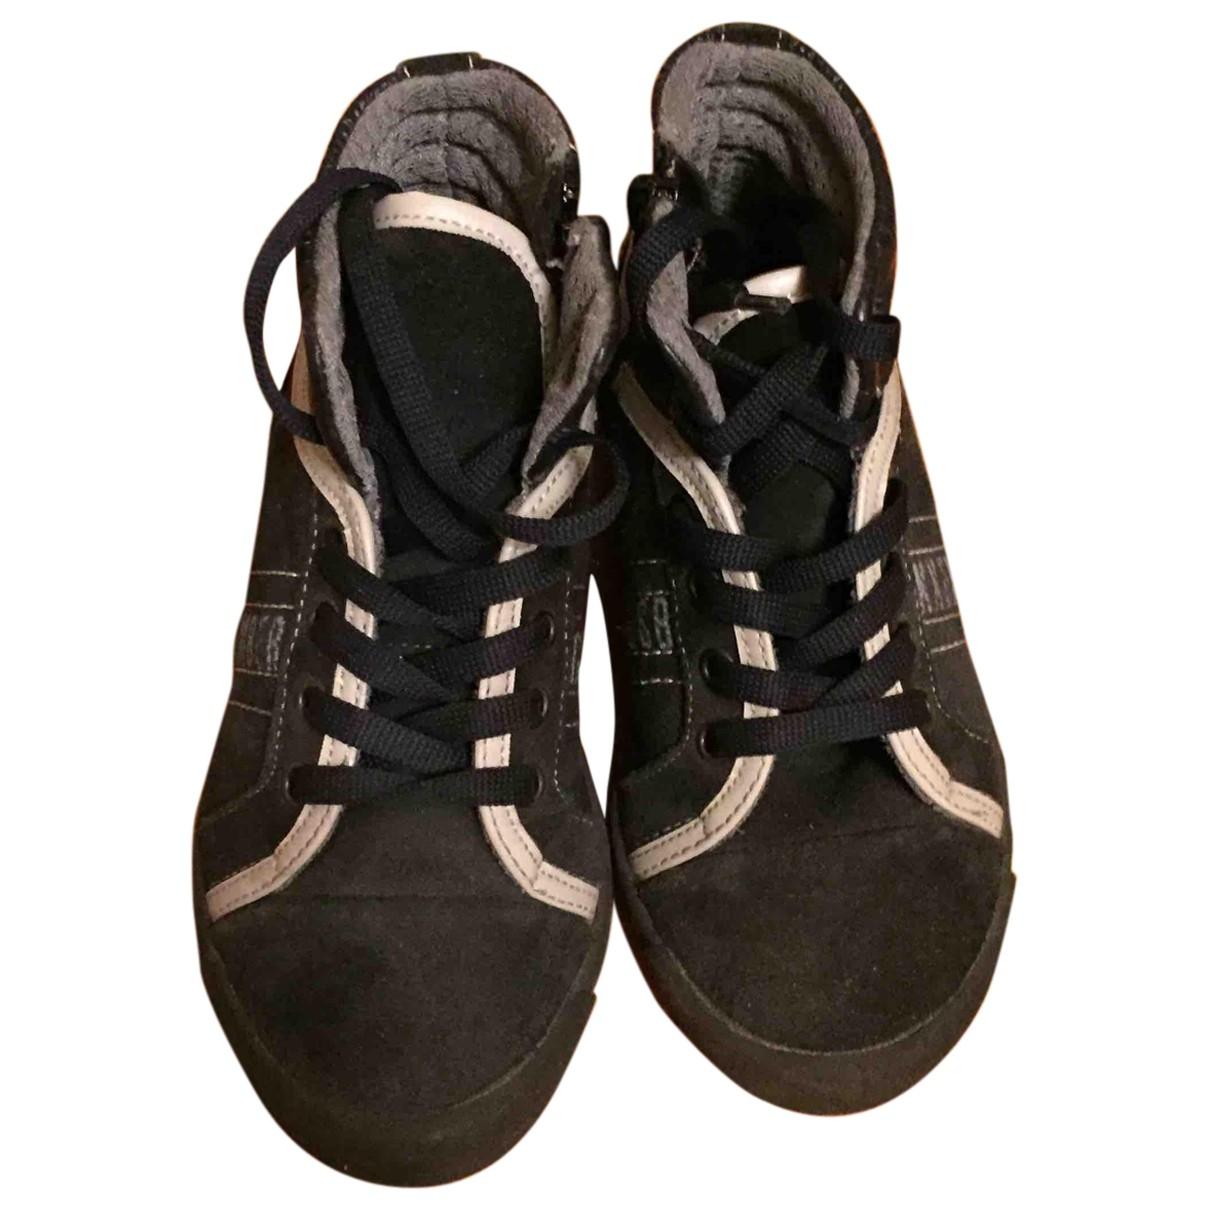 Dirk Bikkembergs \N Blue Suede Boots for Kids 29 EU